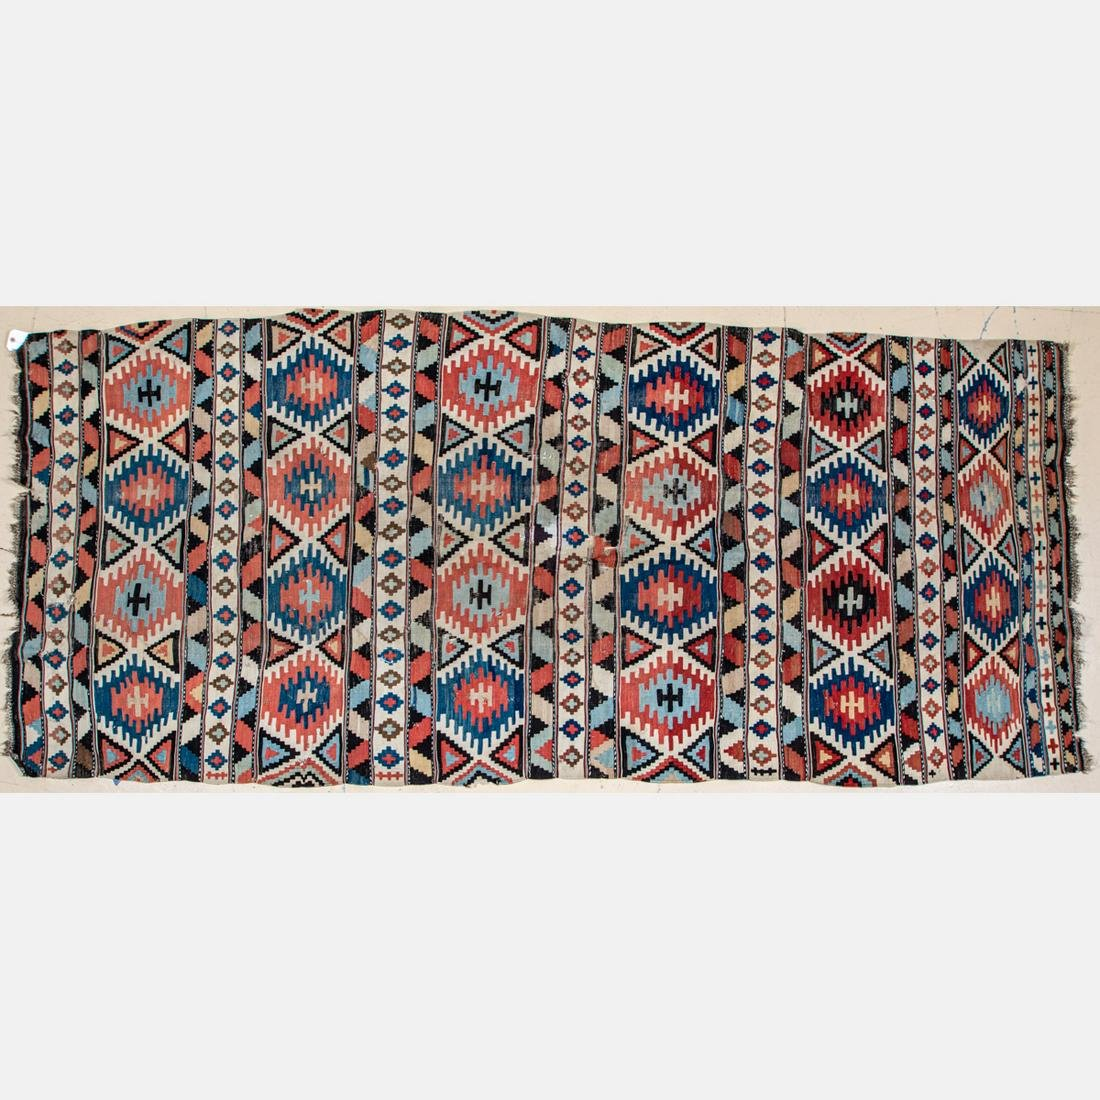 An Antique Caucasian Kazak Kilim Wool Rug, ca. 1890s.